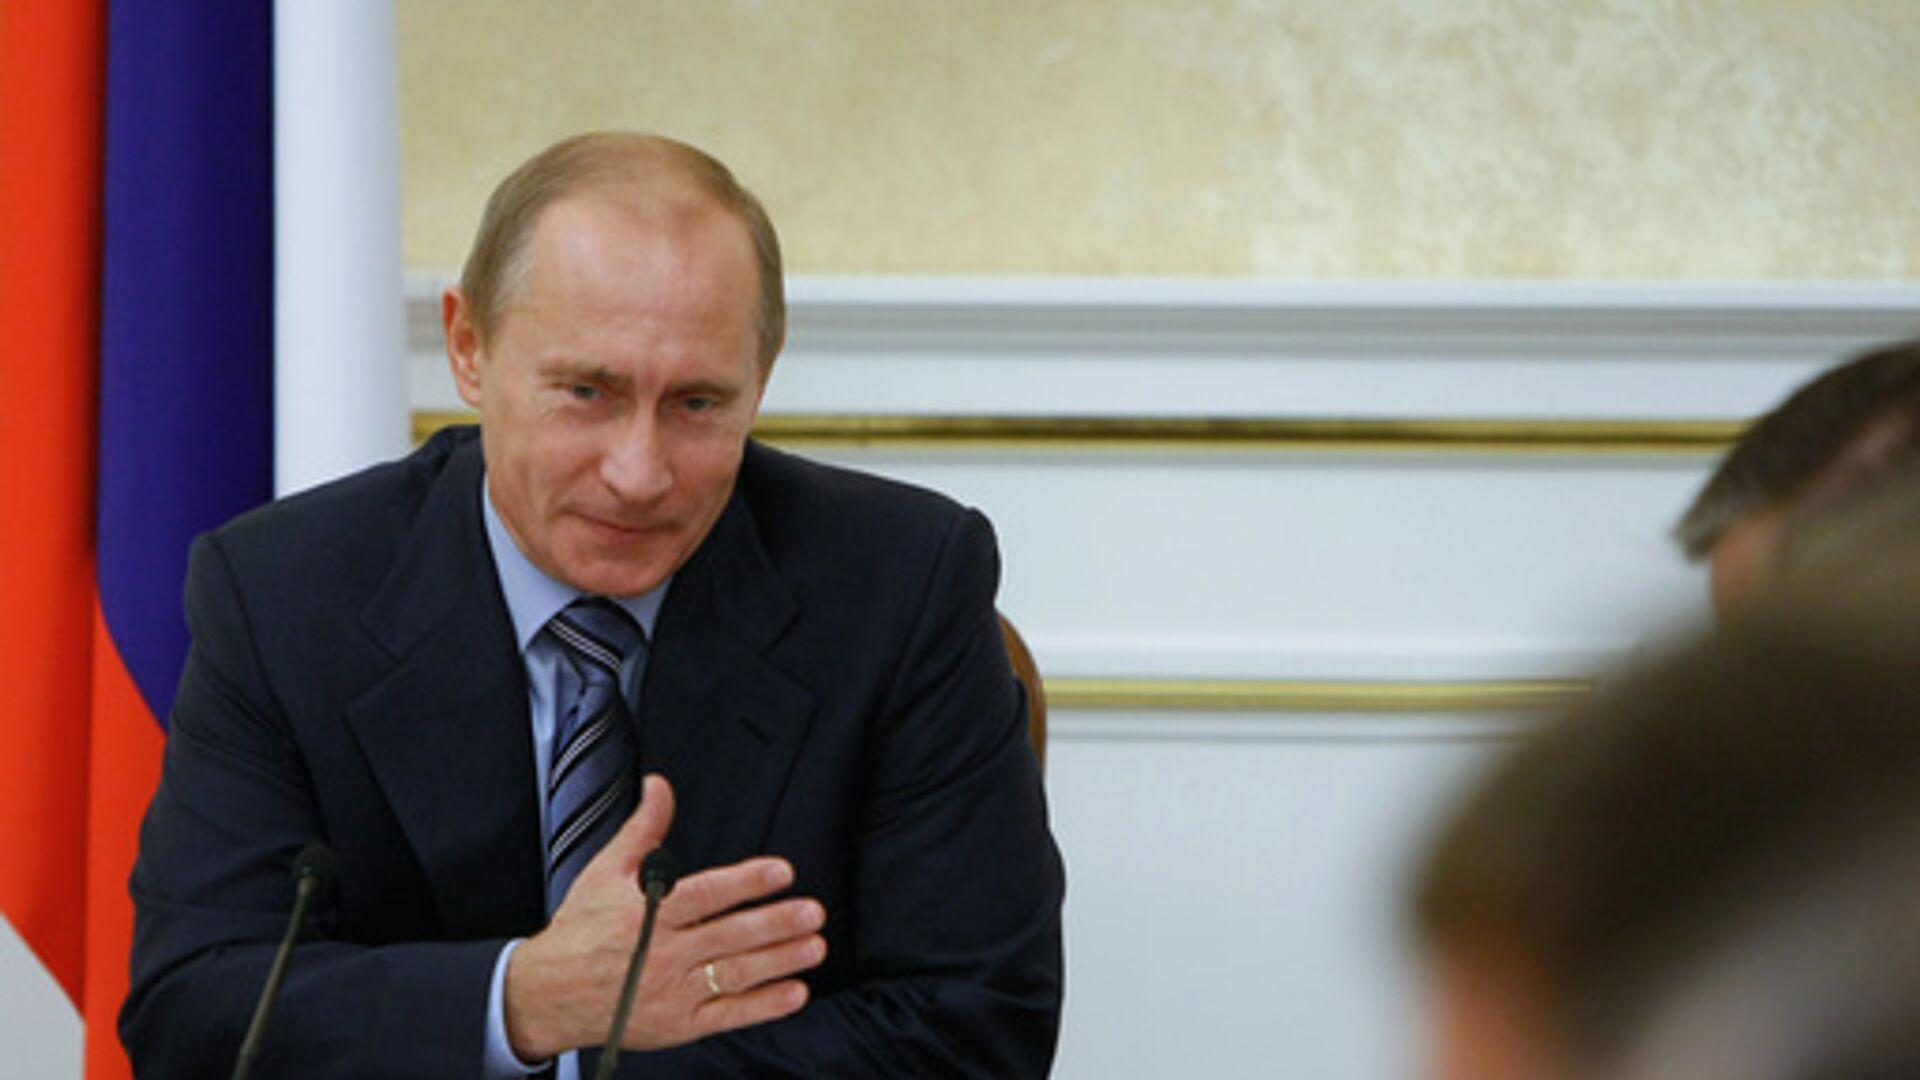 Владимир Путин - РИА Новости, 1920, 12.04.2021